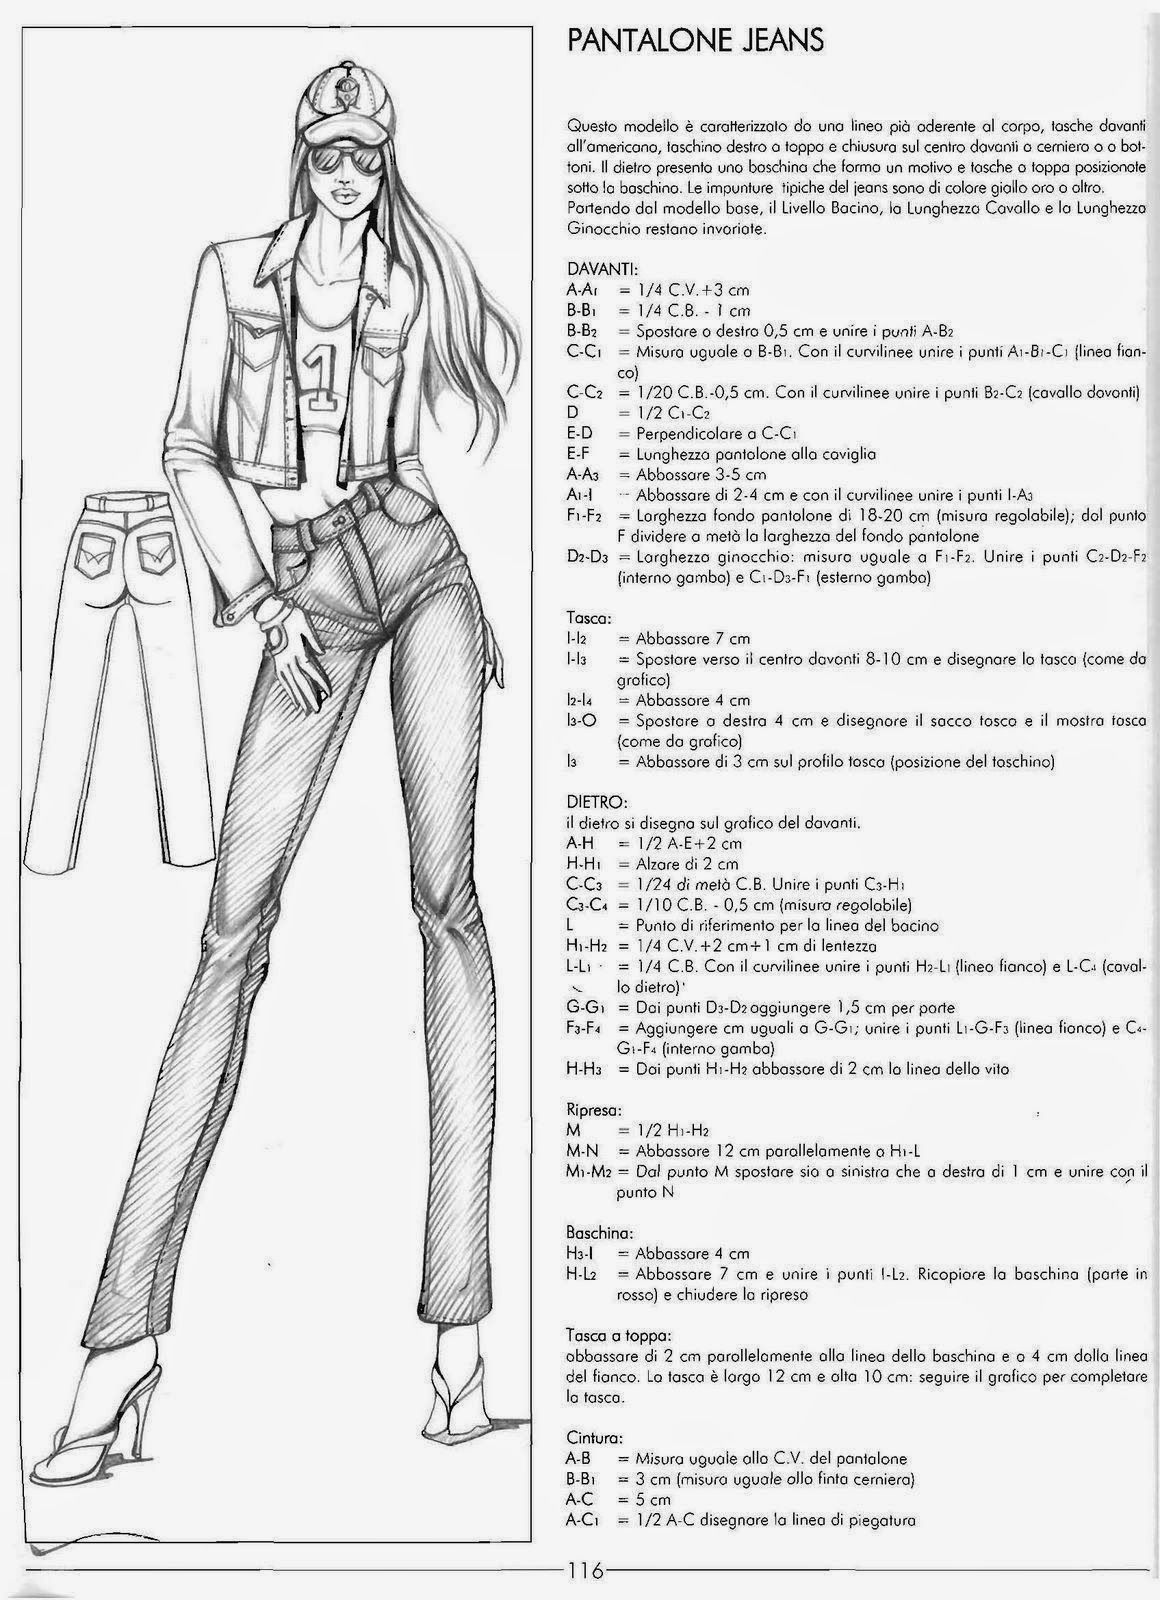 pattern | قصات | Pinterest | Dress design patterns, Pattern